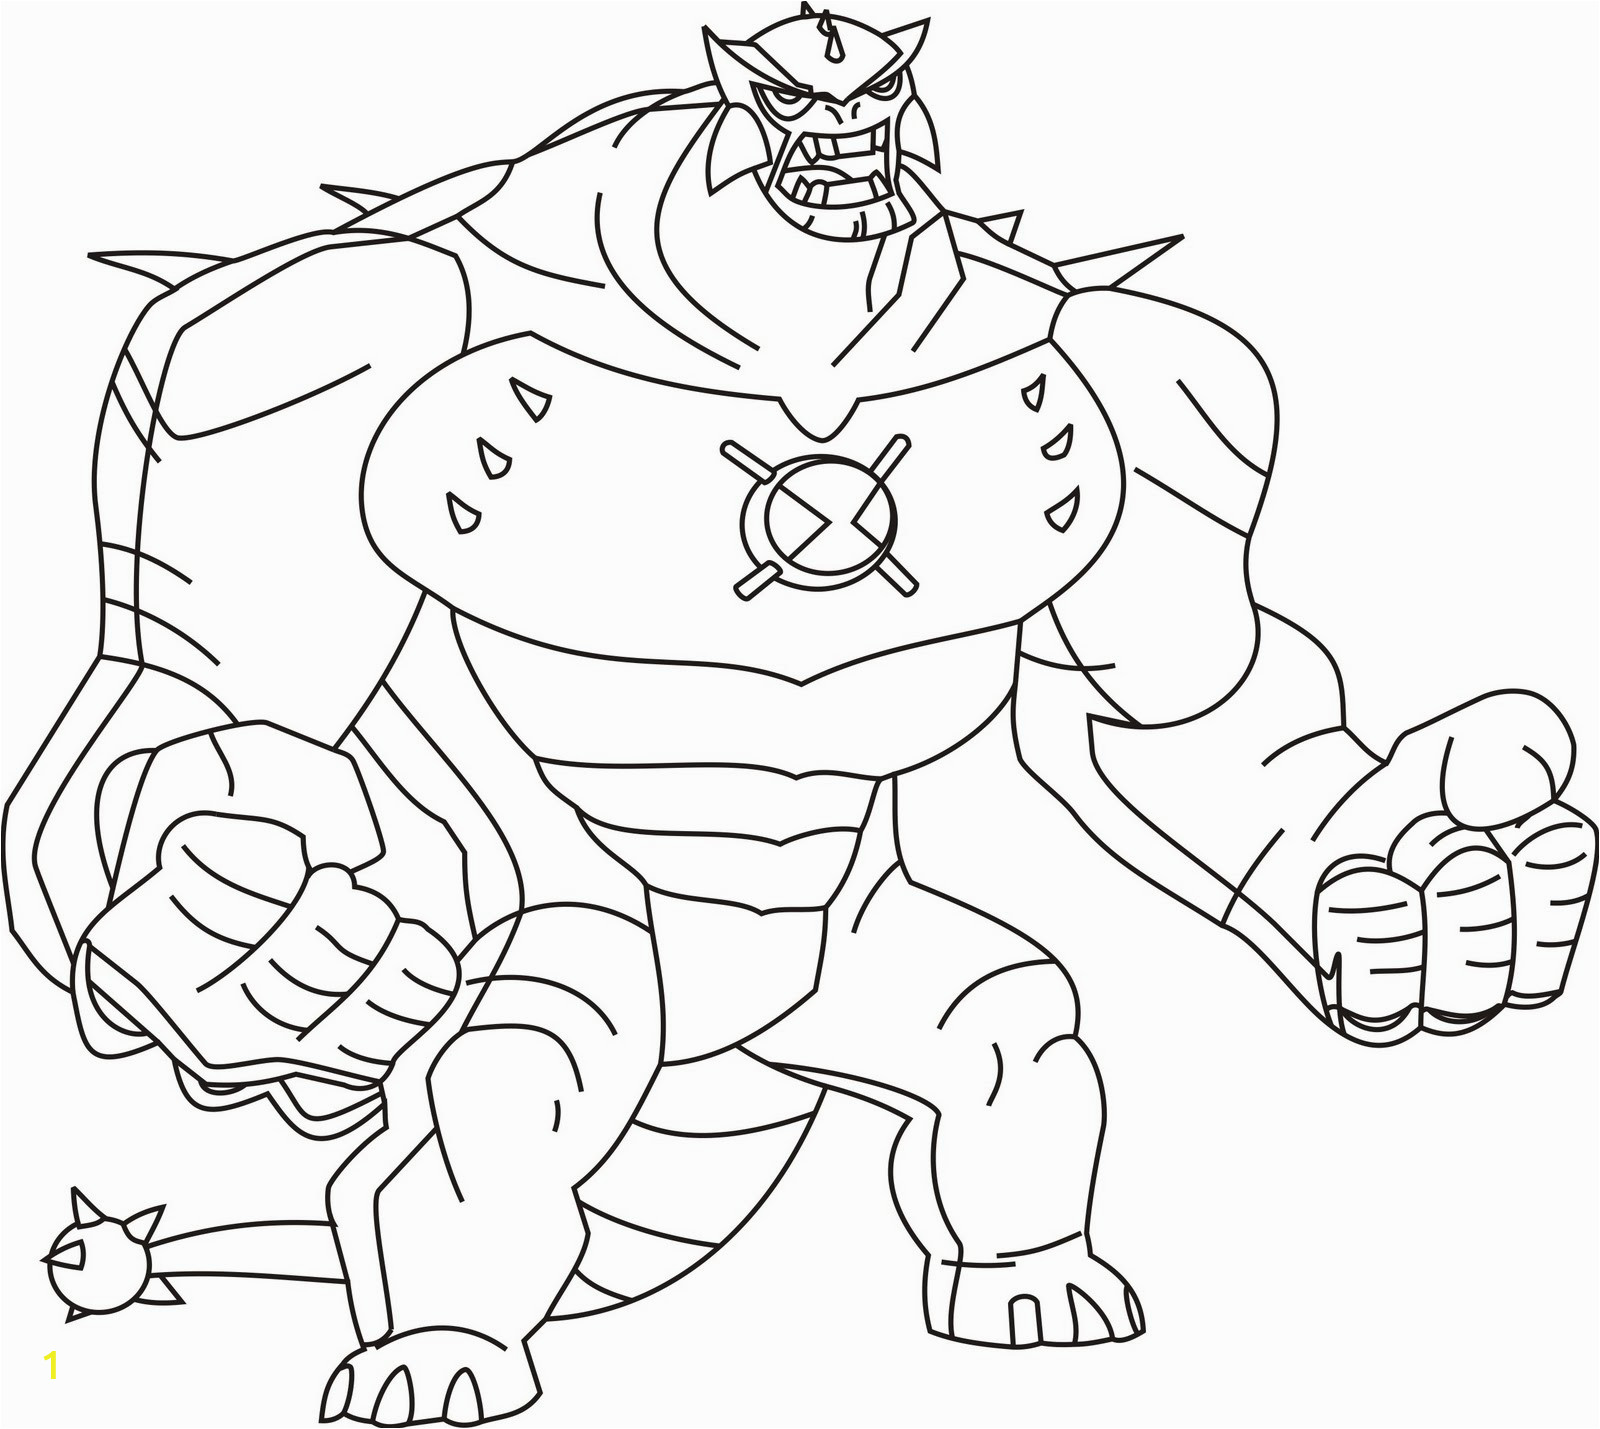 for ben 10 aliens coloring sketch templates